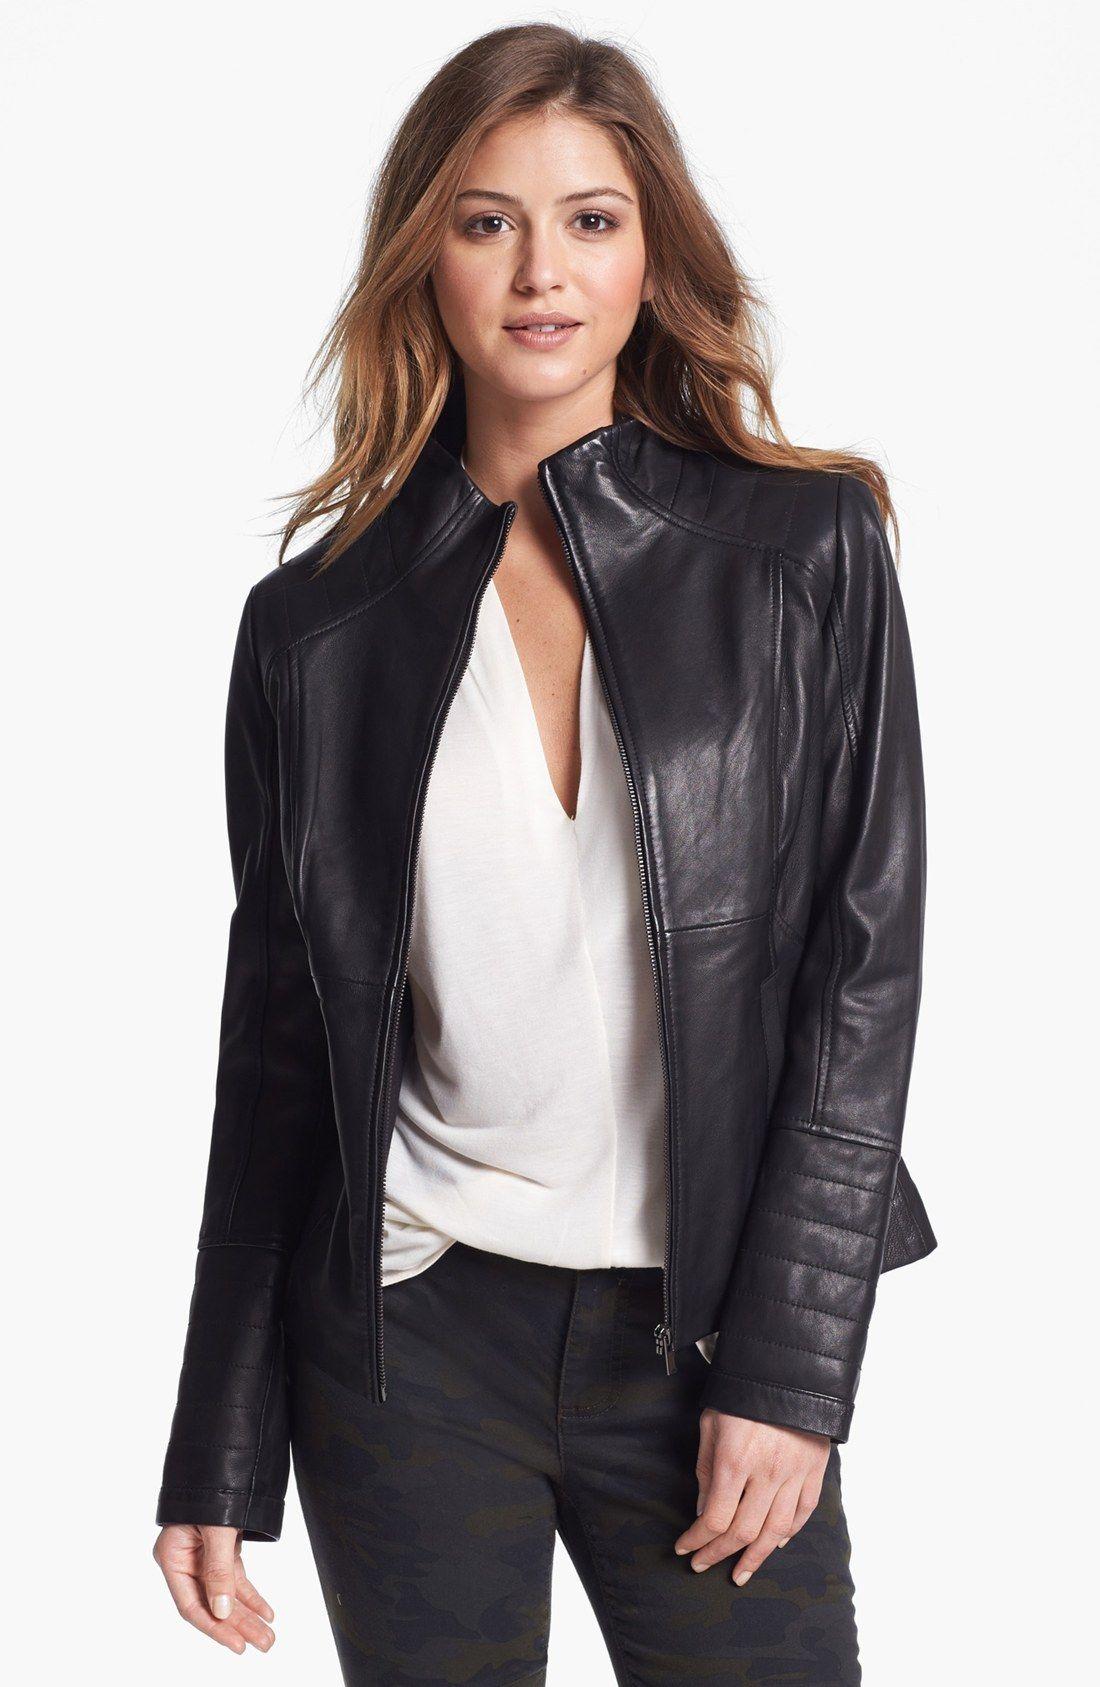 womens casual leather jacket - Google Search | Vegan Biker Jackets ...